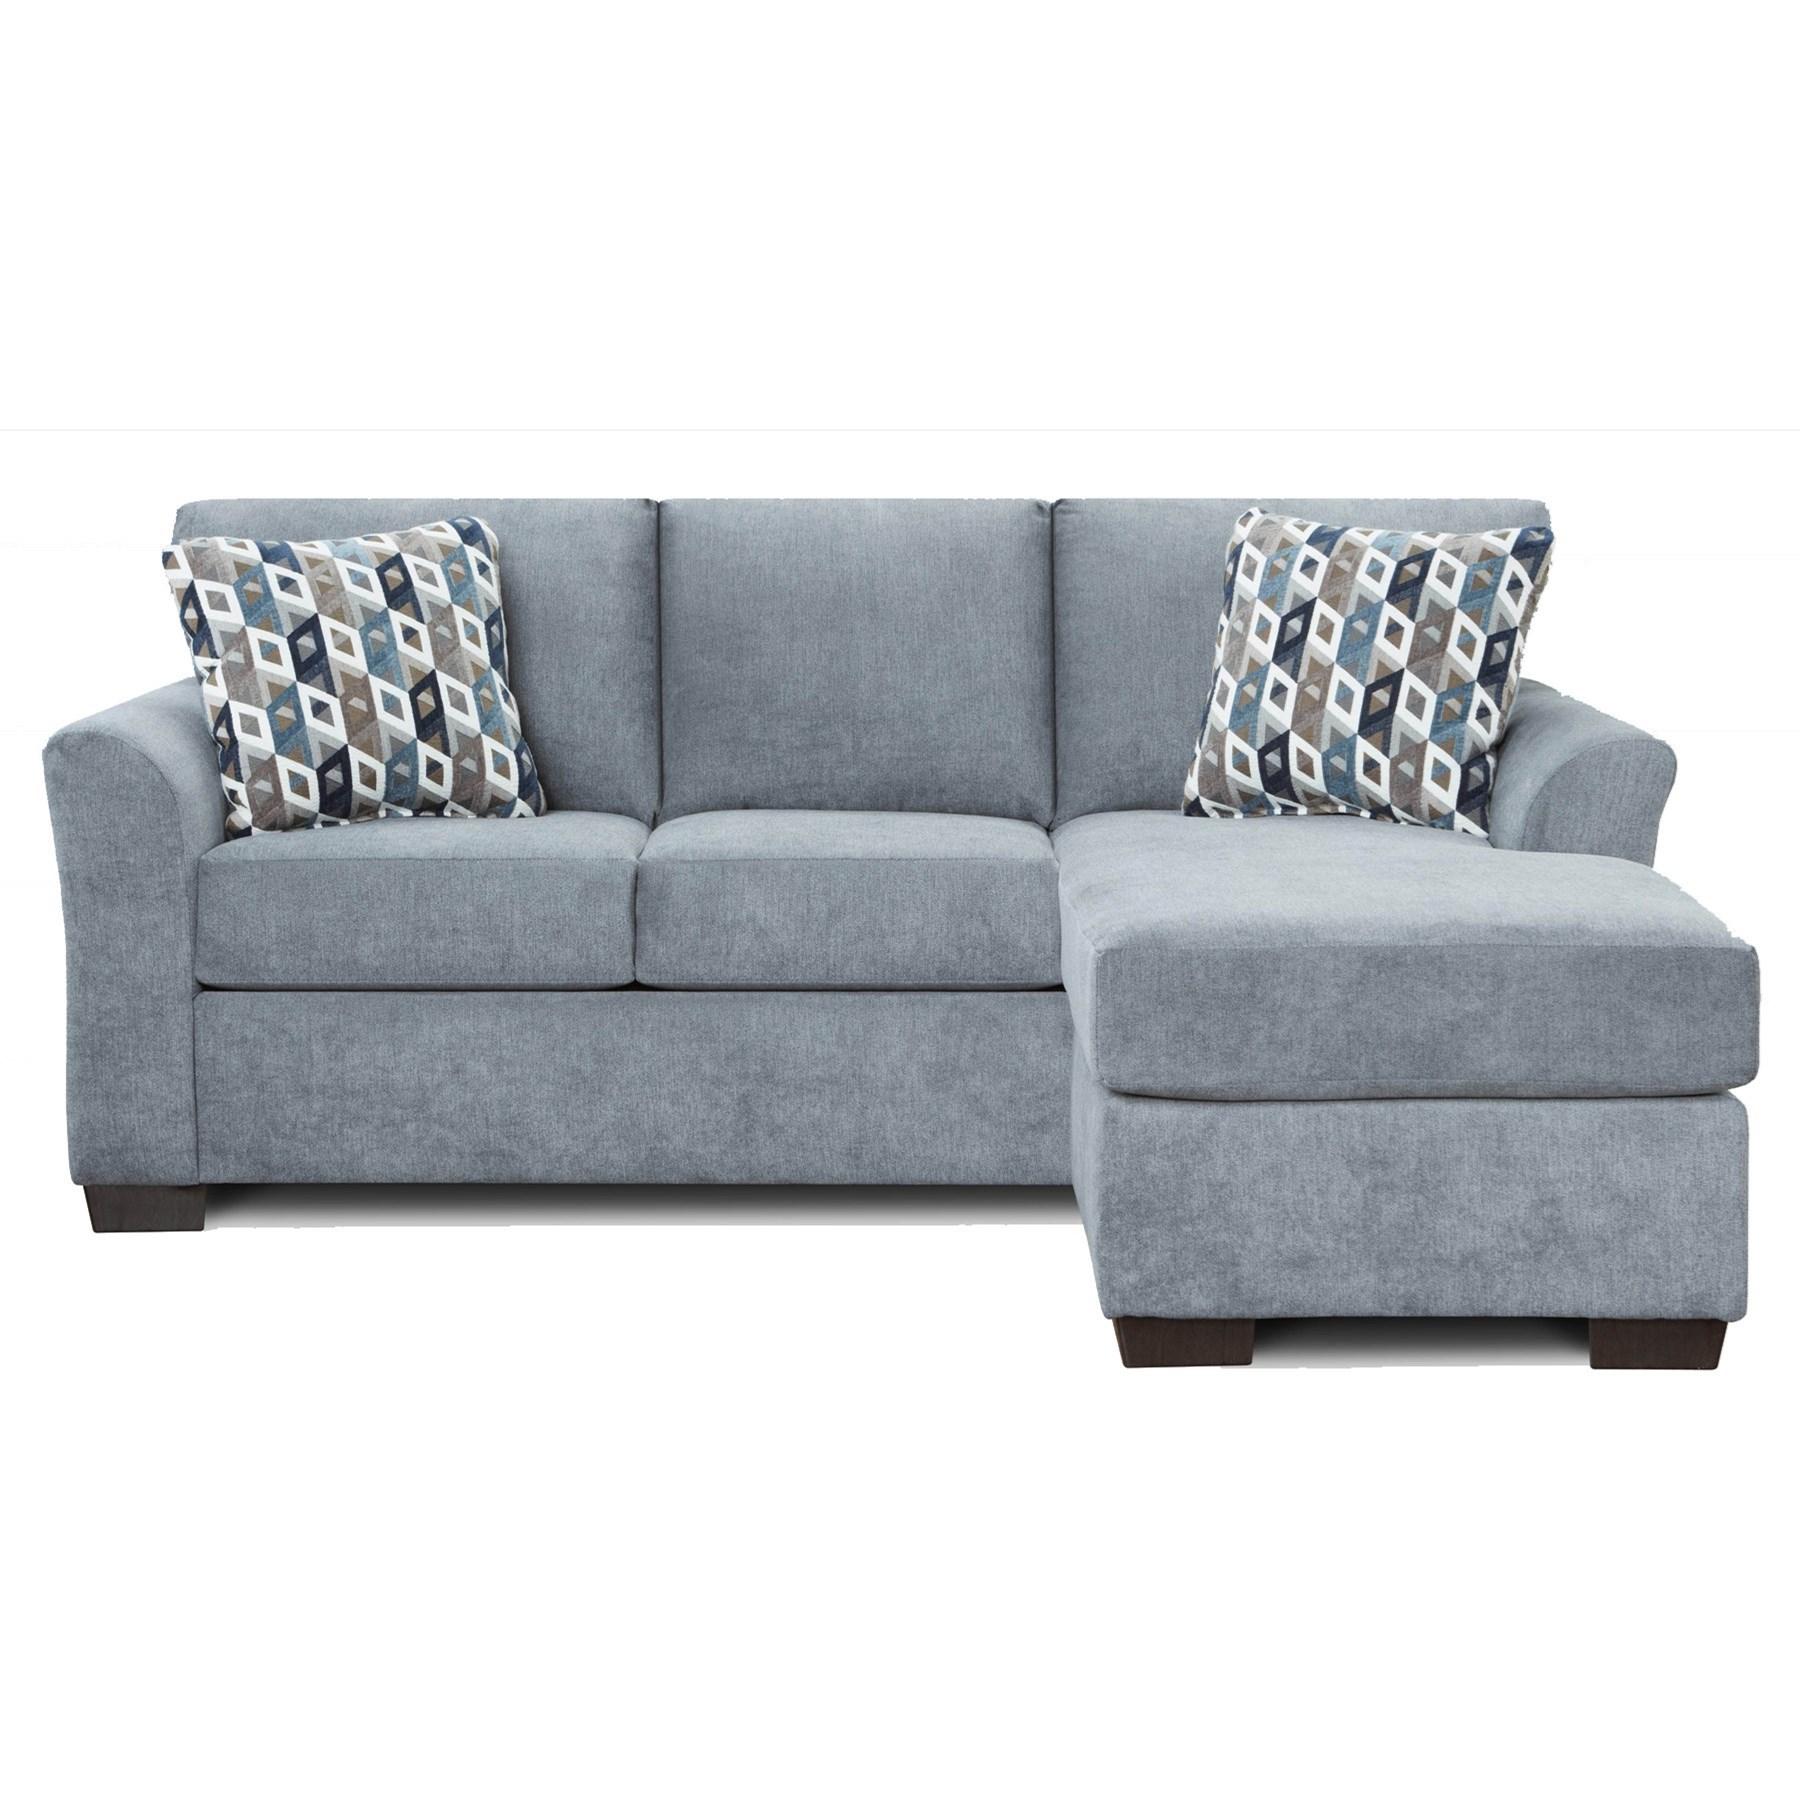 cosmopolitan 3900 queen sleeper sofa with chaise